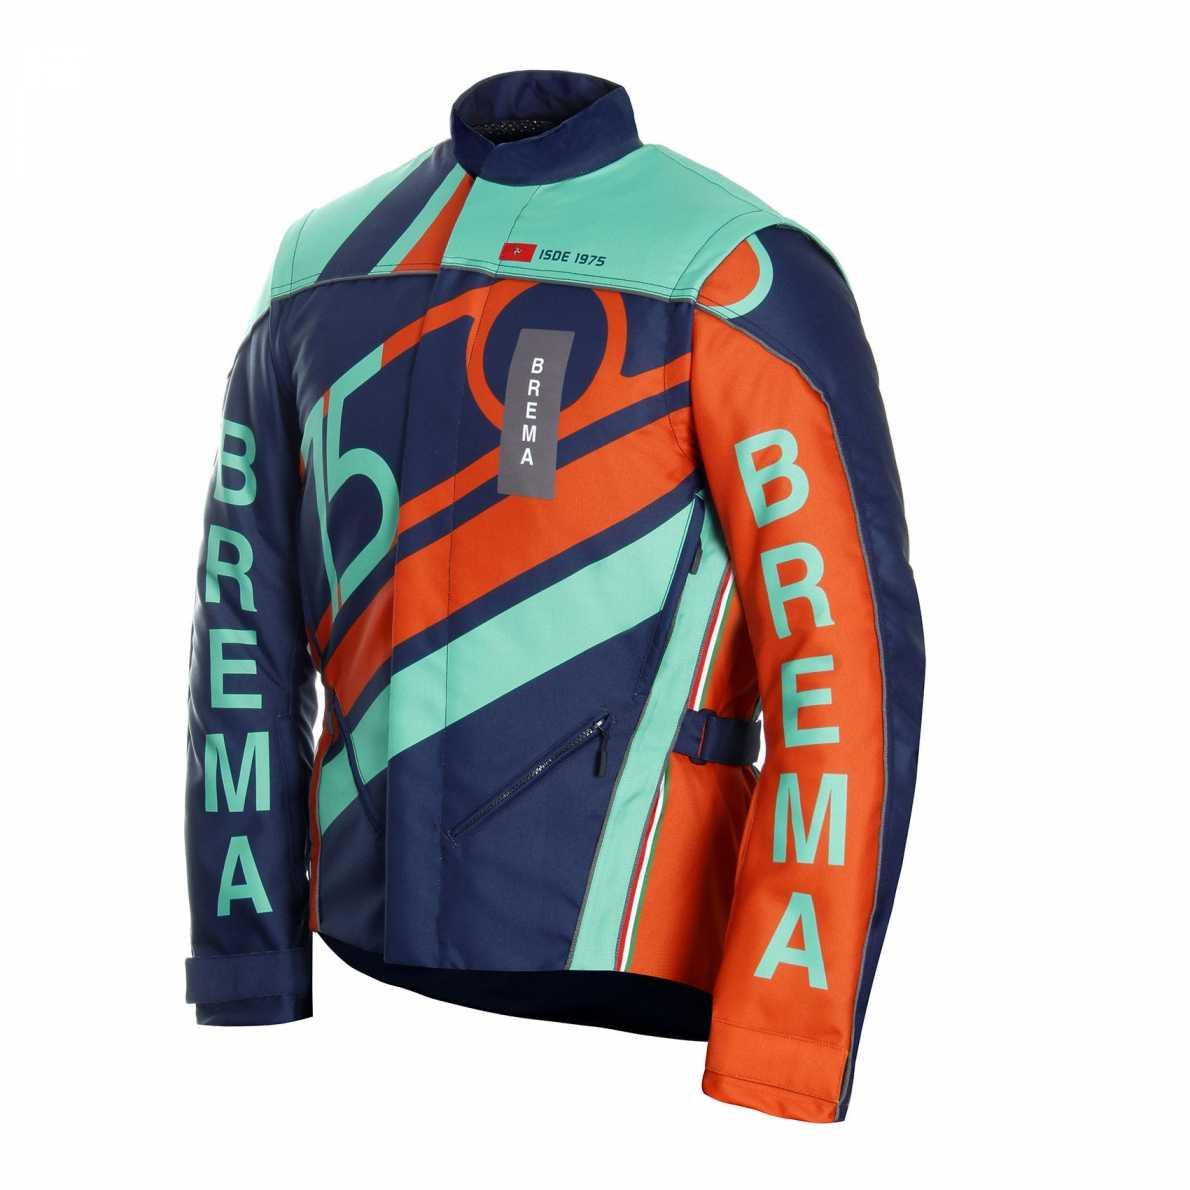 Veste BREMA TROFEO 75. Crédits : ©accessoires-moto-enduro-cross.fr 2016